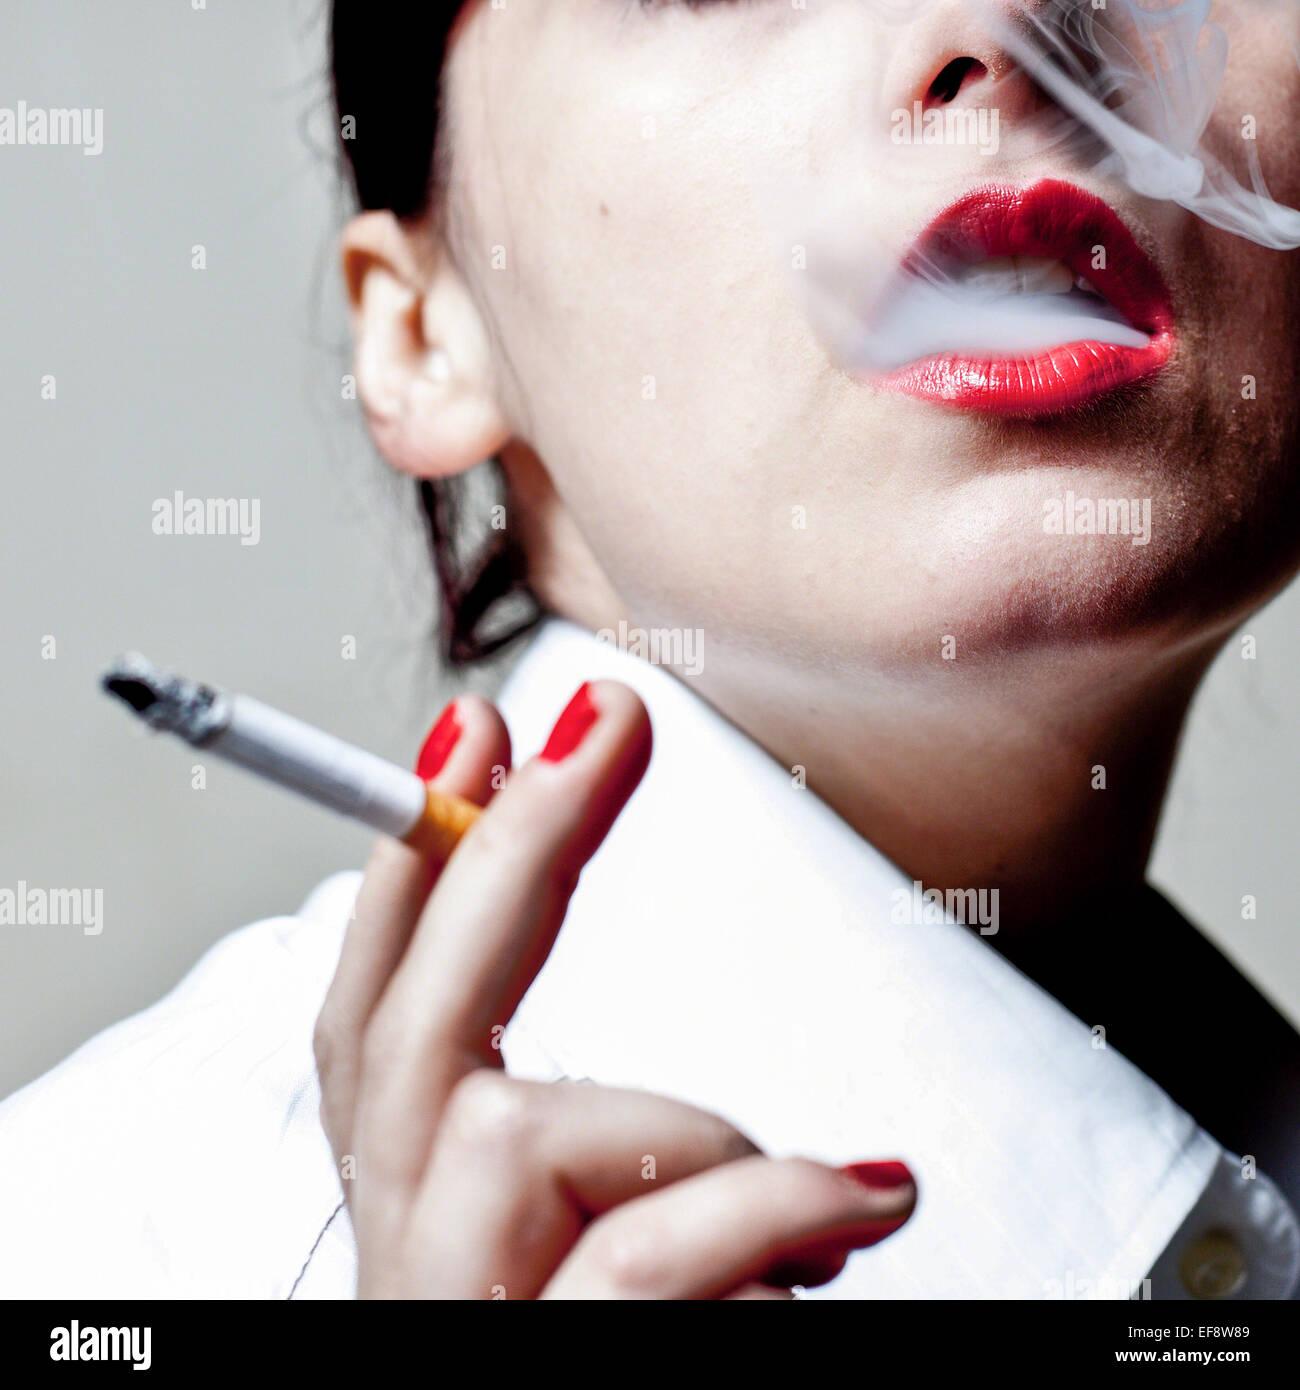 Woman smoking cigarette - Stock Image